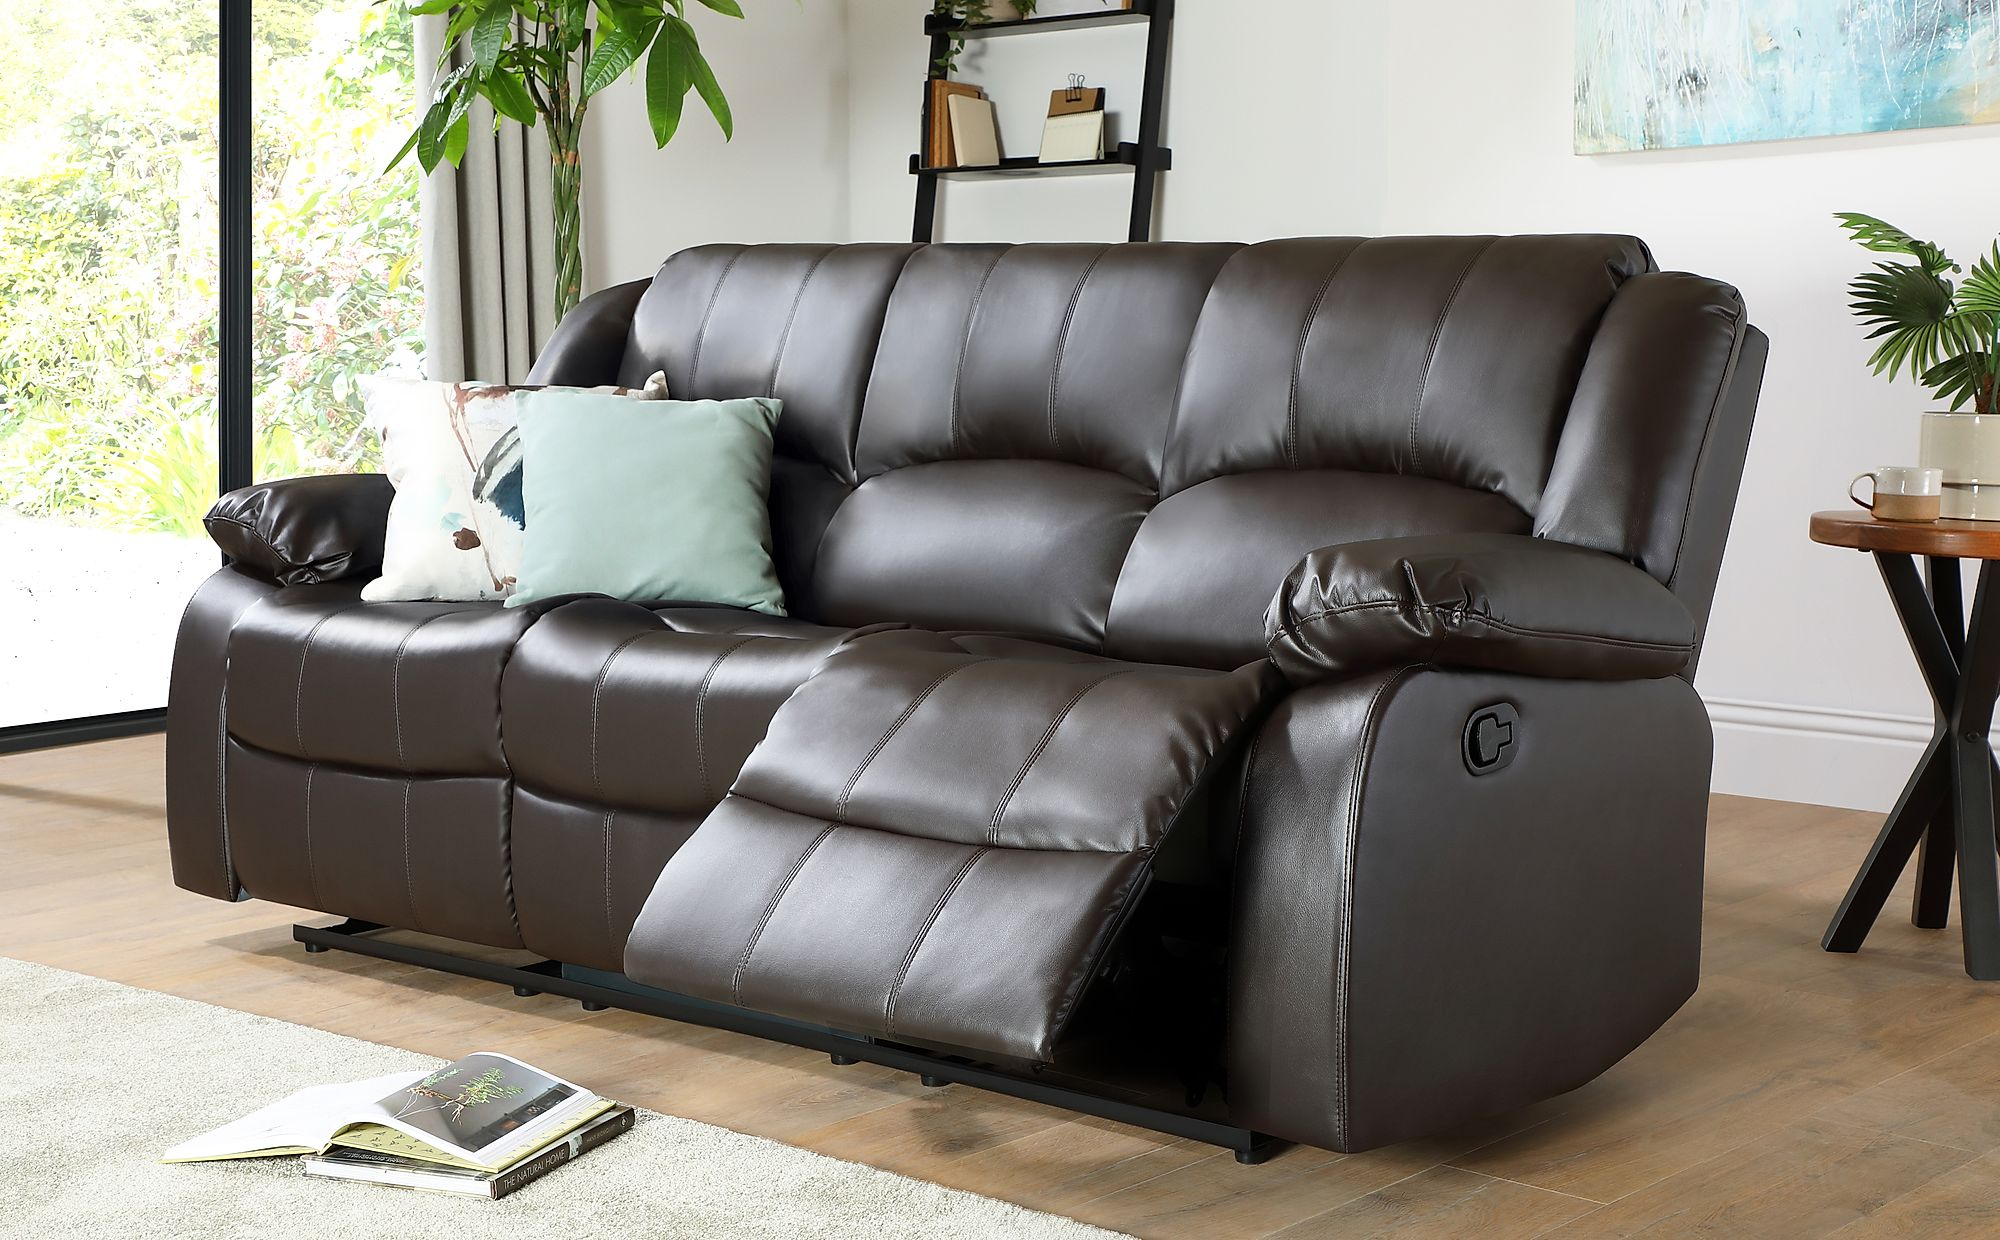 dakota 3 seater leather recliner sofa brown only 549 99 rh furniturechoice co uk 3 seater recliner sofa covers 3 seater recliner sofa leather